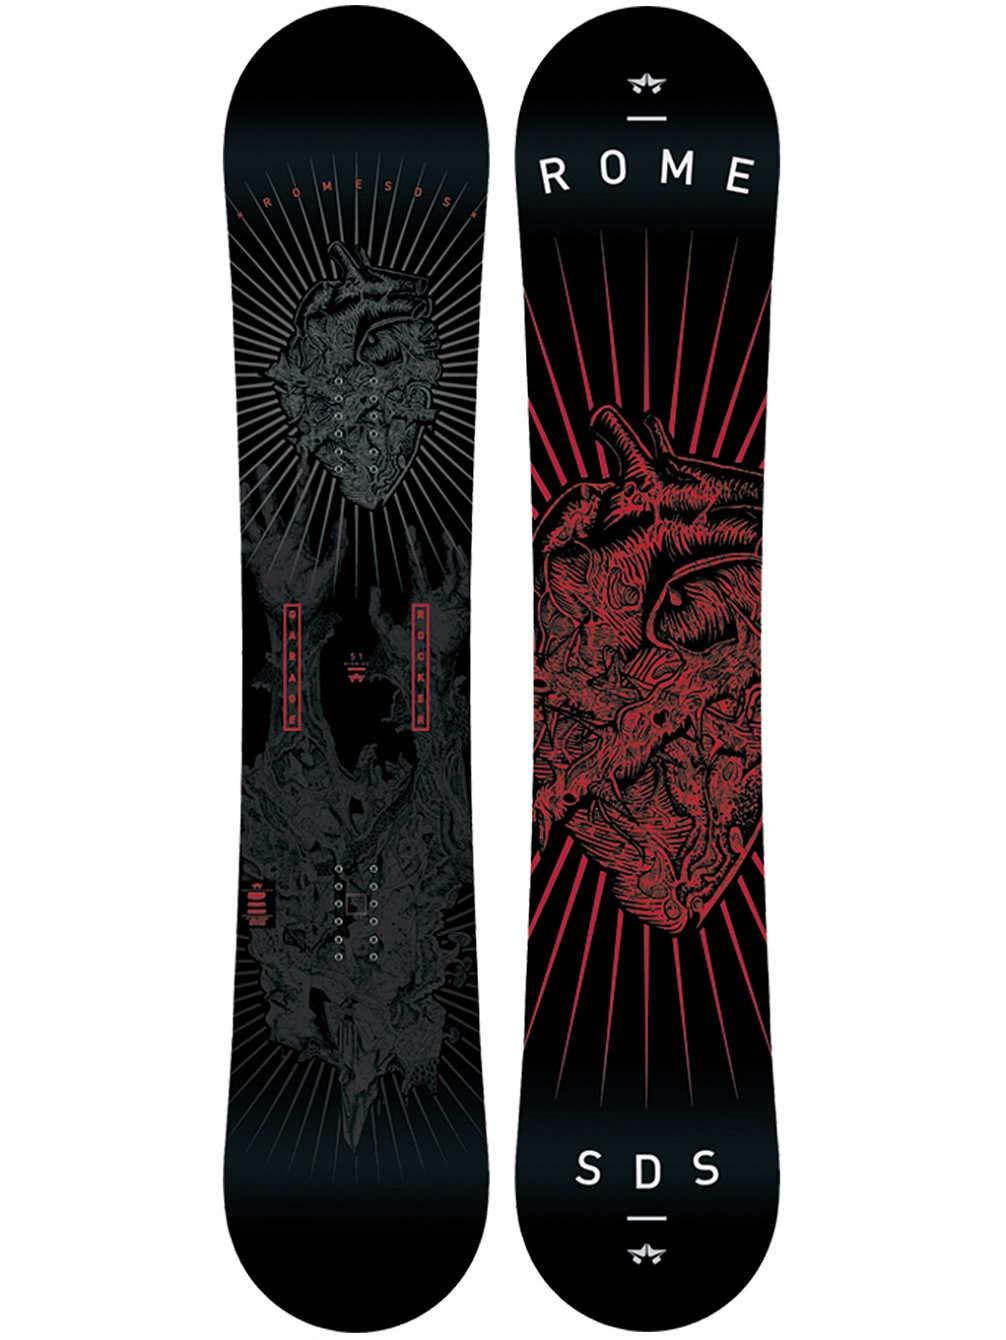 Hombre Freestyle Snowboard Rome Garage Rocker midwide 157 2016 multi-ed Talla:160W: Amazon.es: Deportes y aire libre